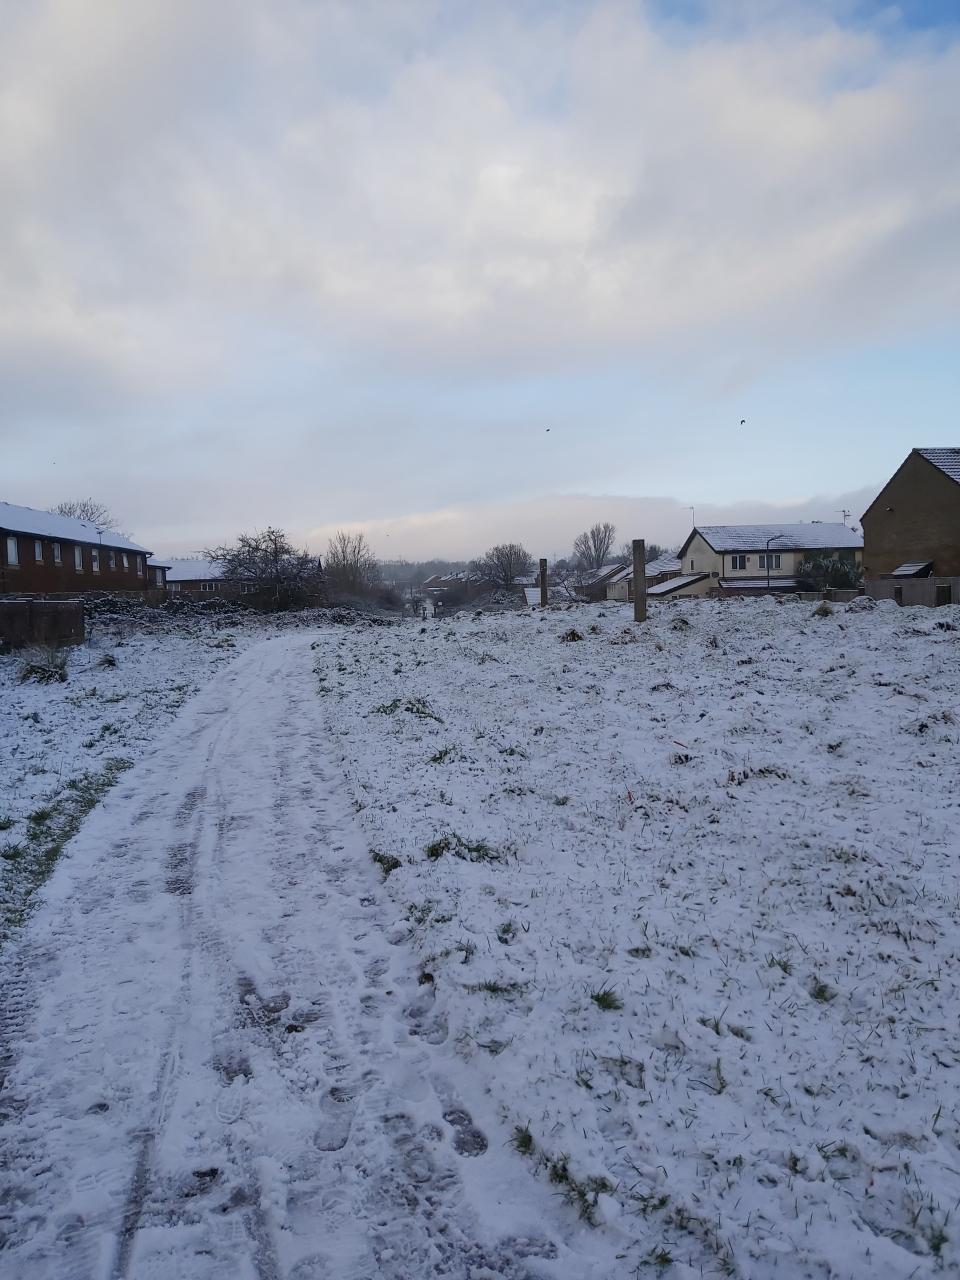 Lovely snow here